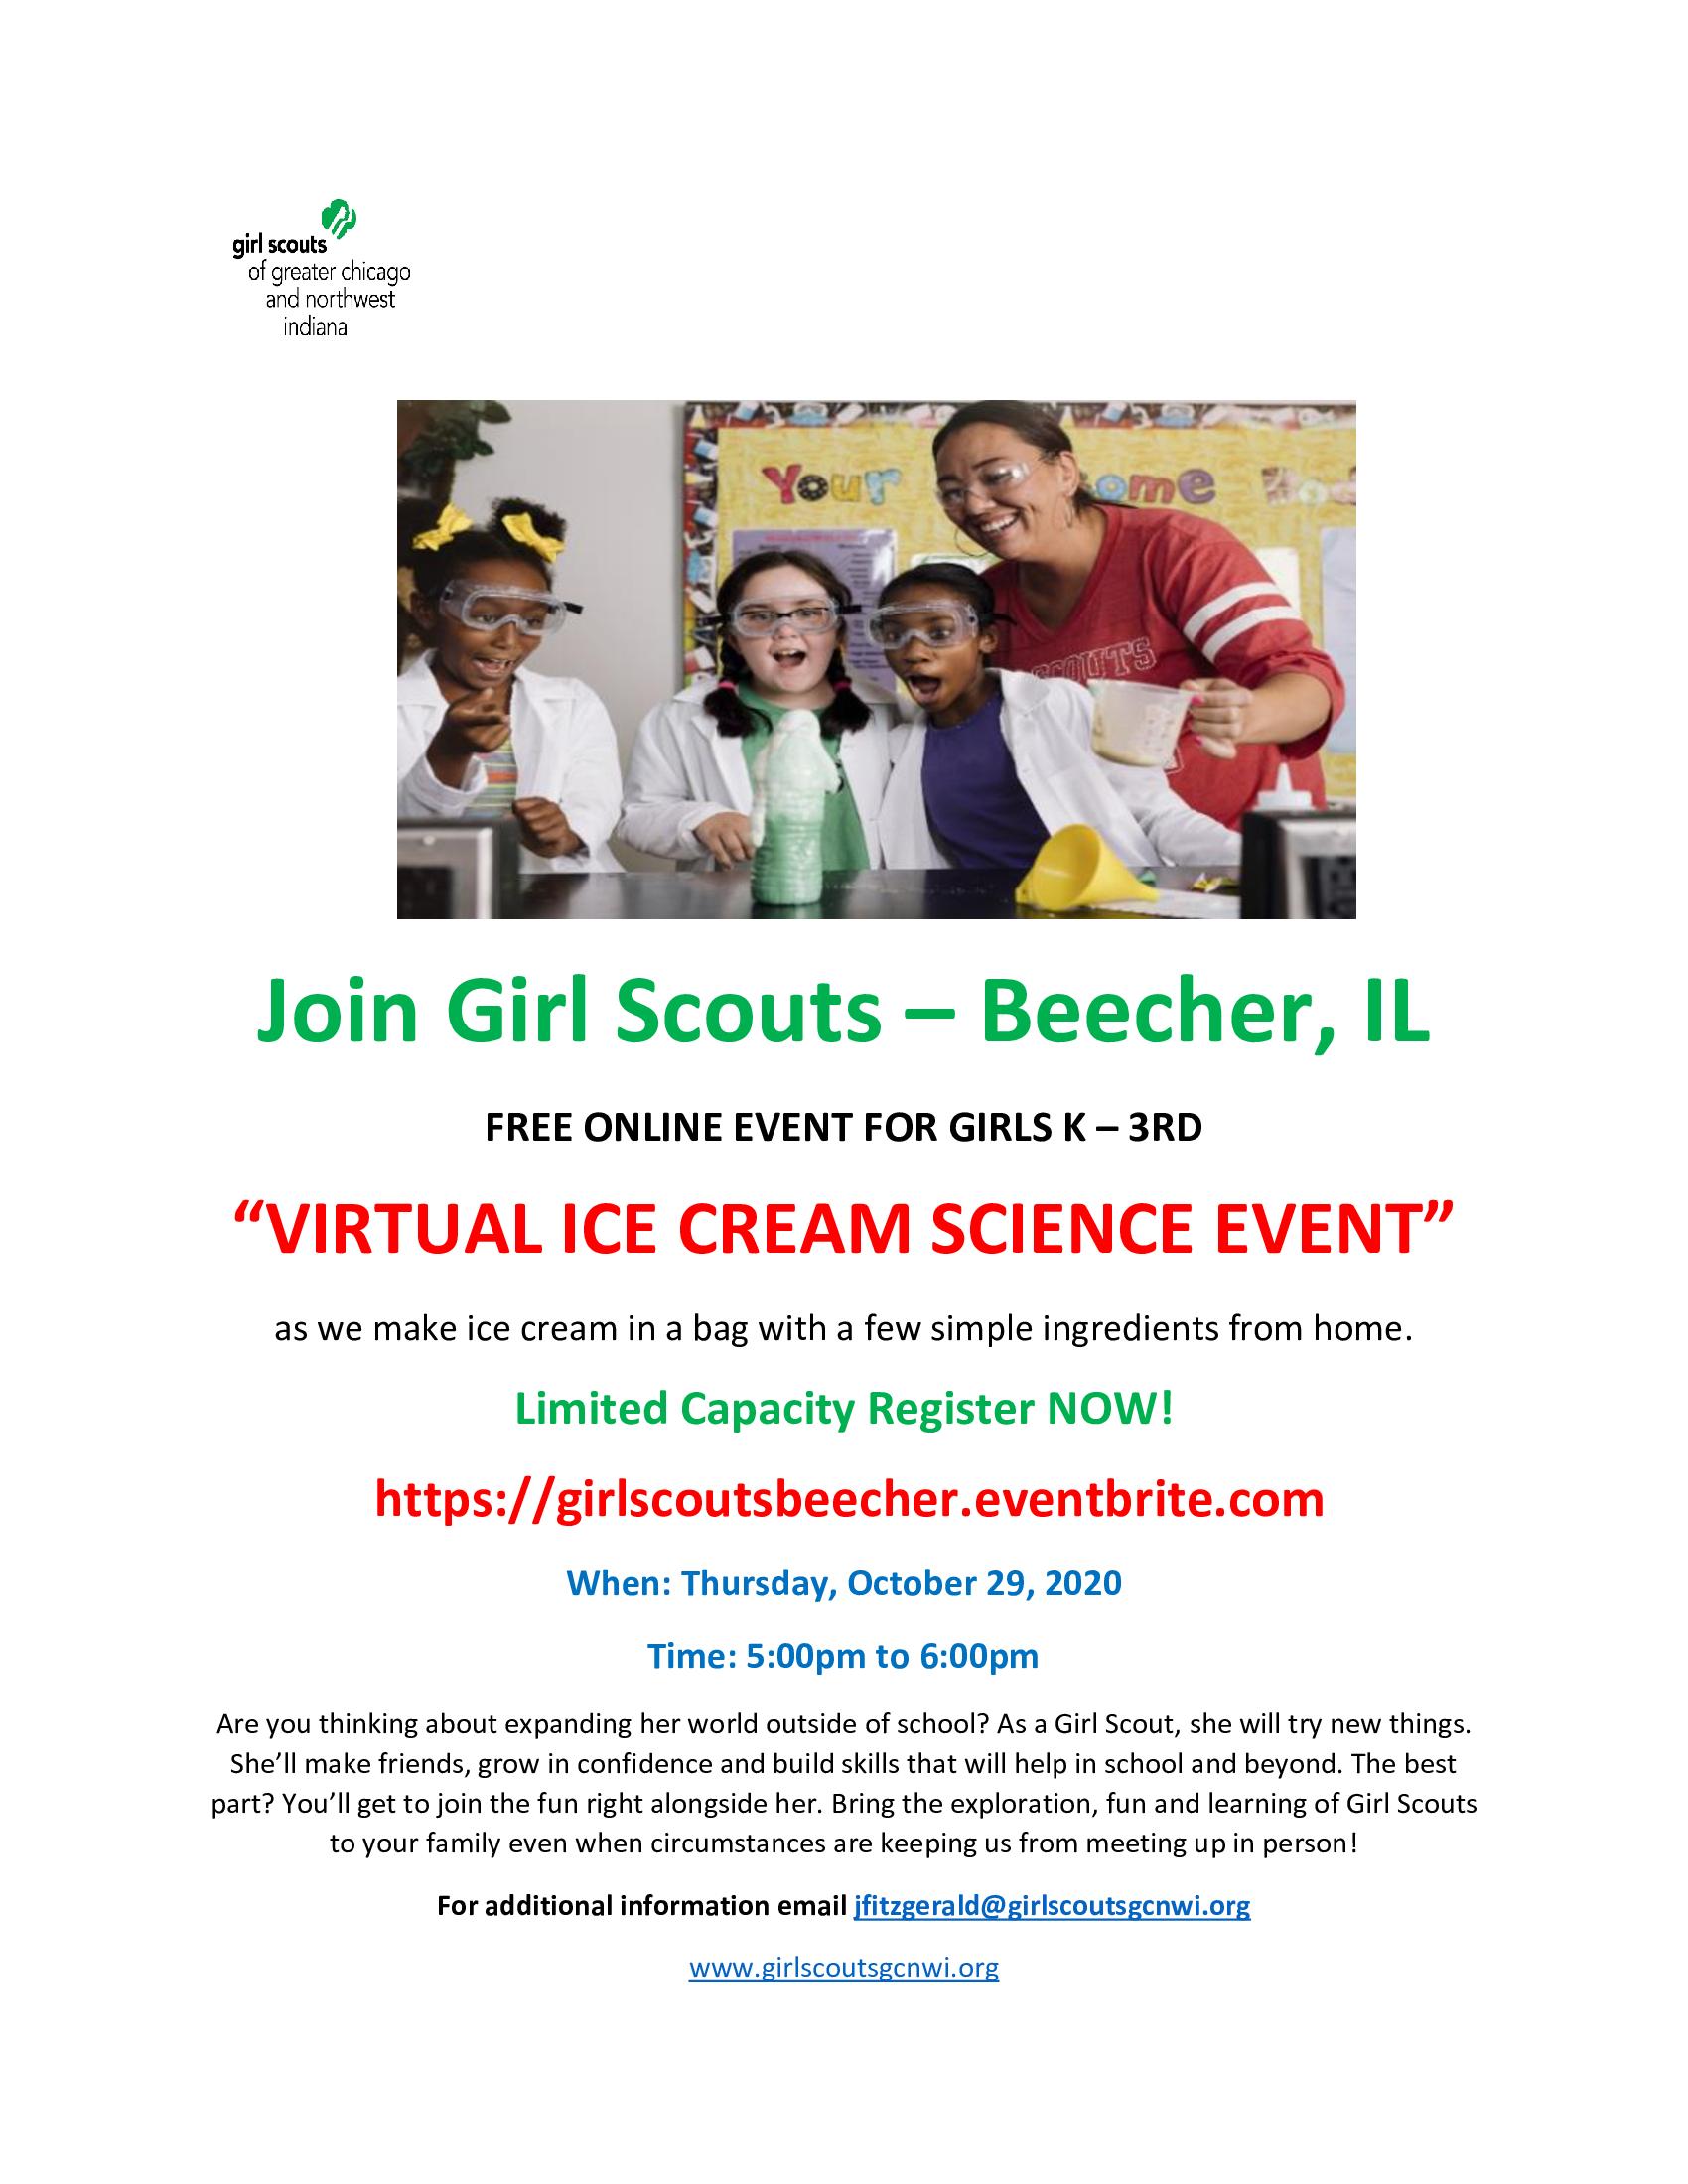 Girl Scouts Ice Cream Event